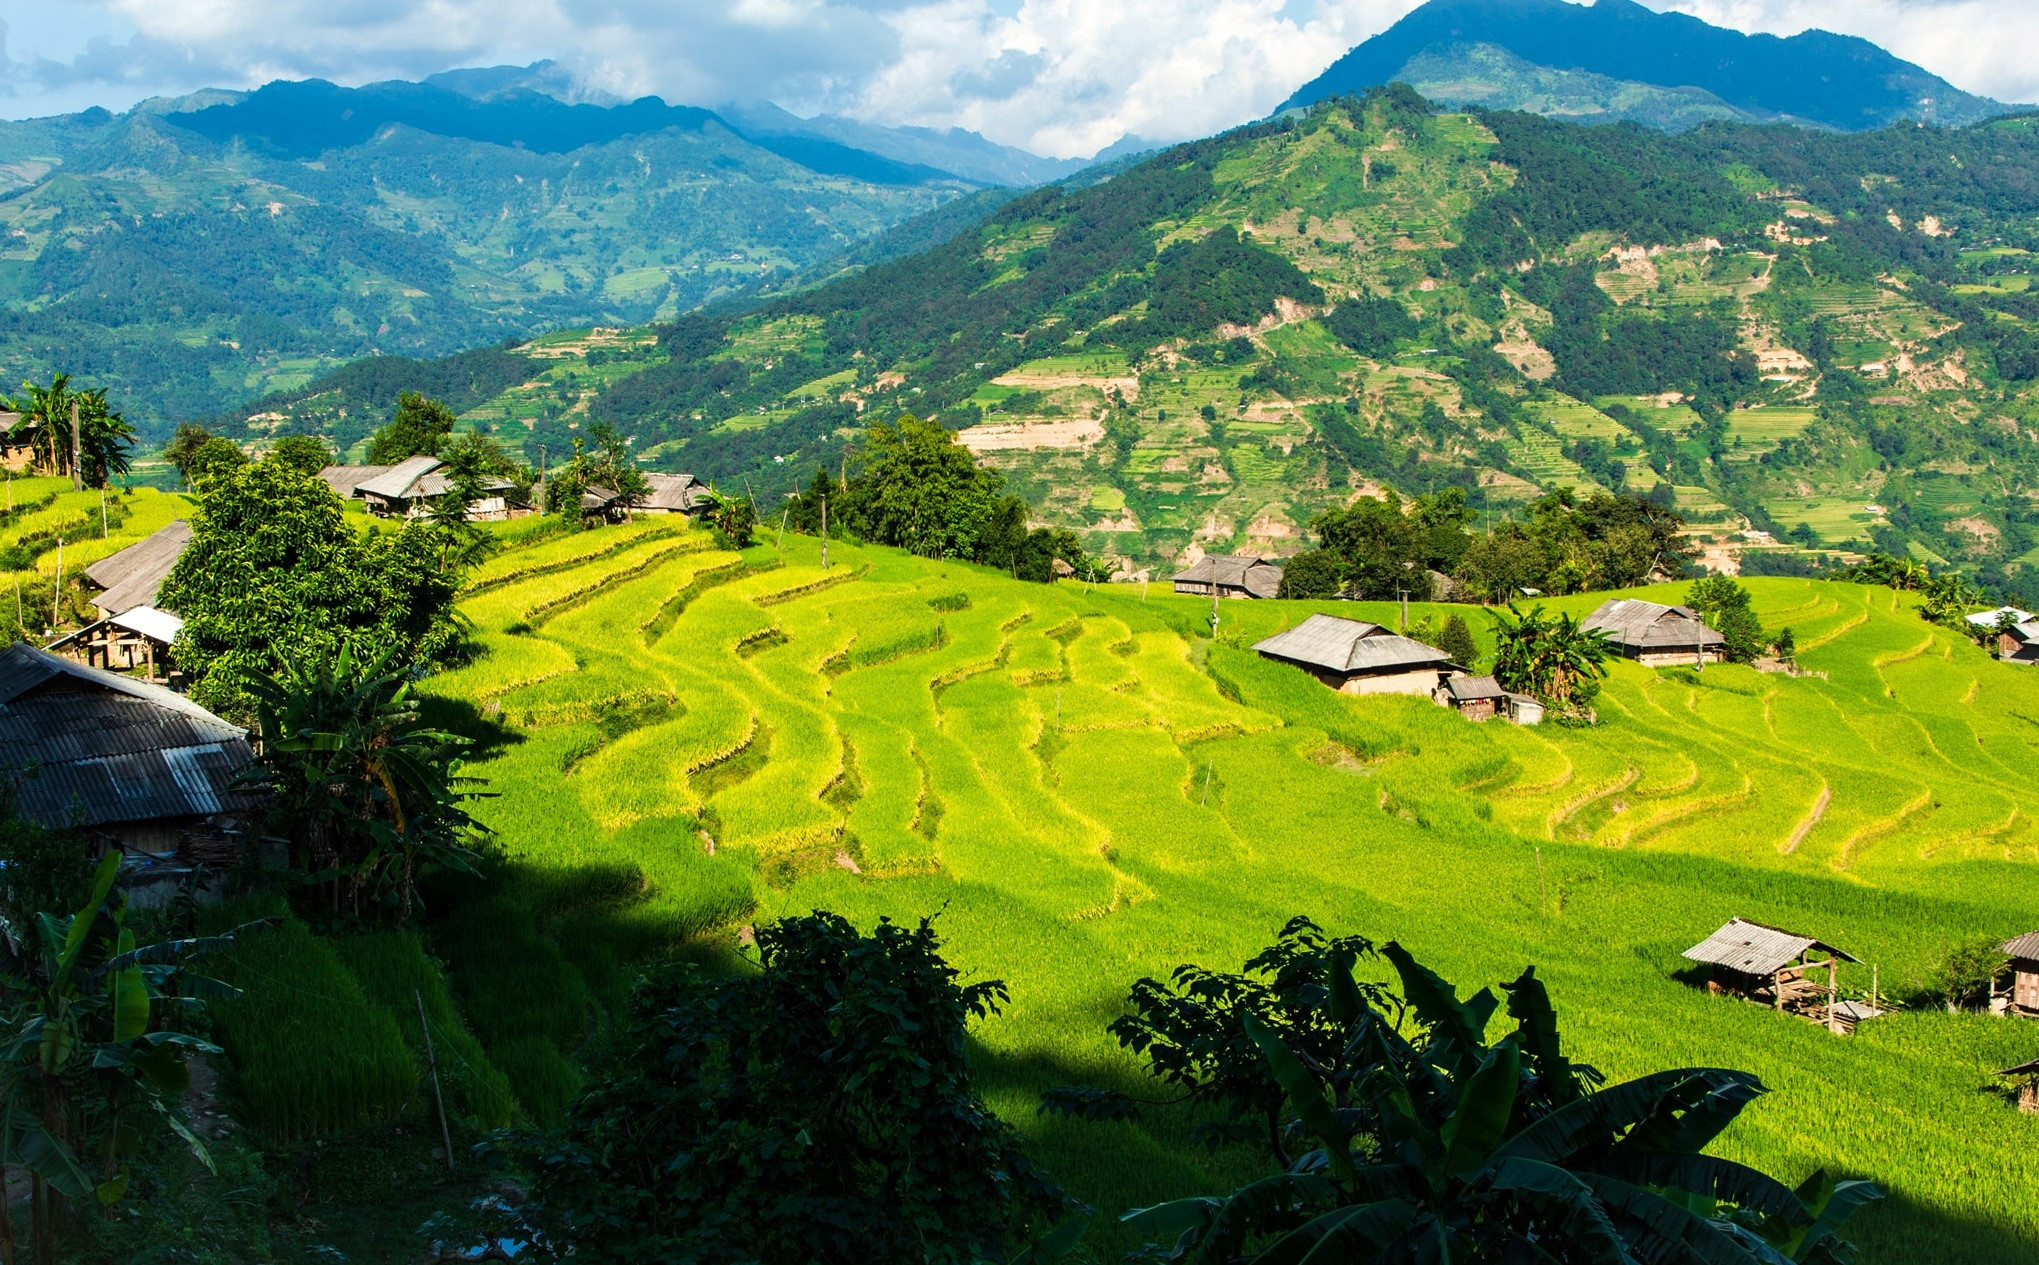 rice terraces in Hoàng Su Phì vietnam